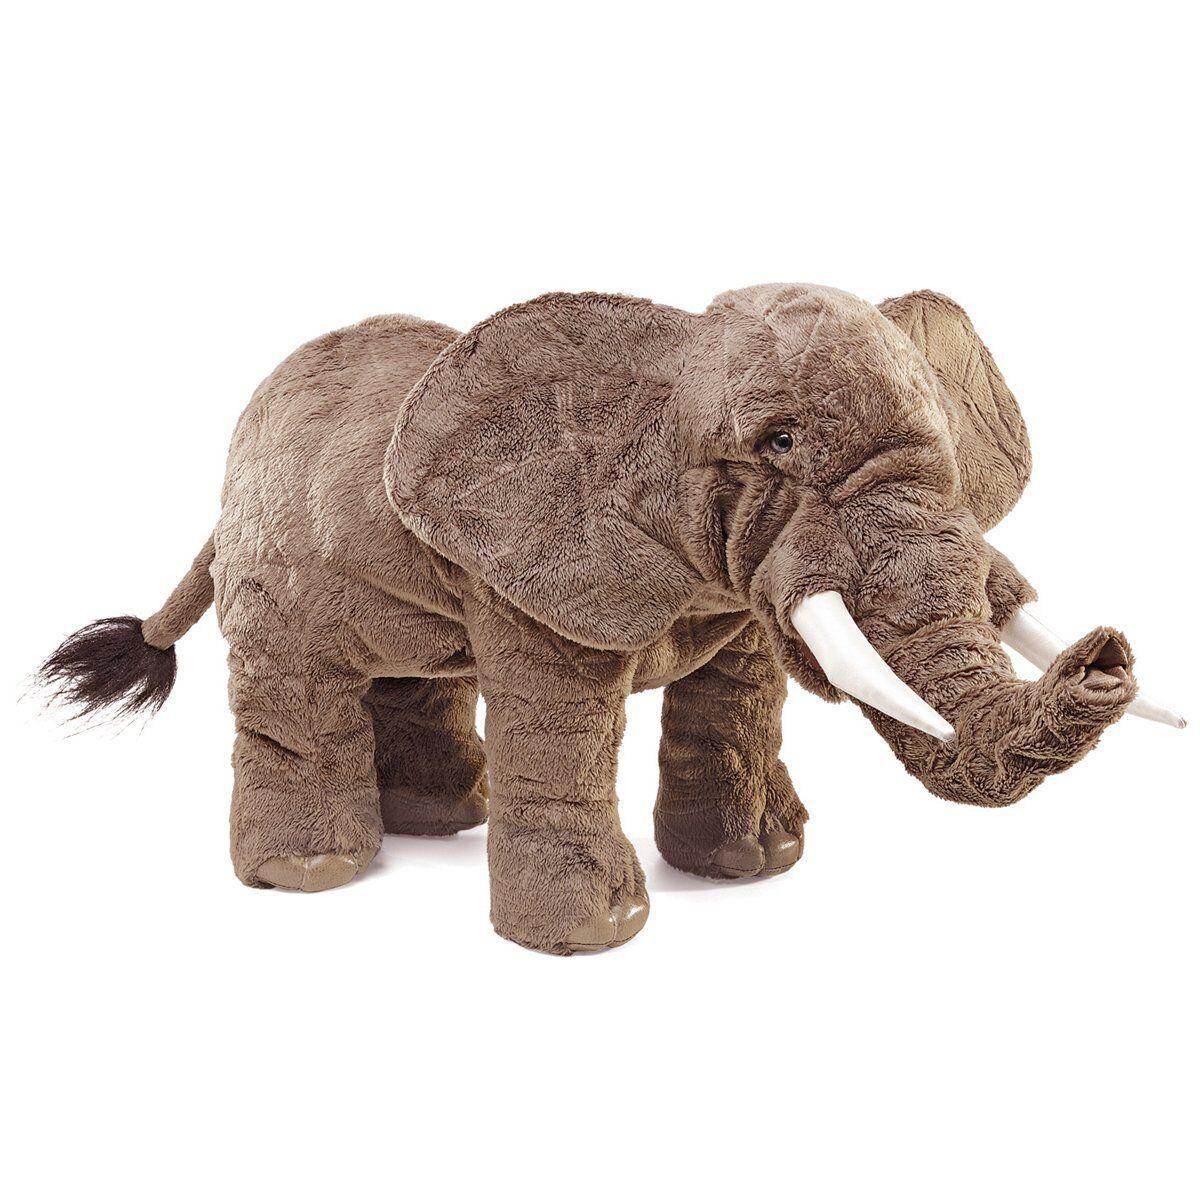 Hand Puppet - Folkmanis - Elephant New Animals Soft Doll Plush Toys 2534